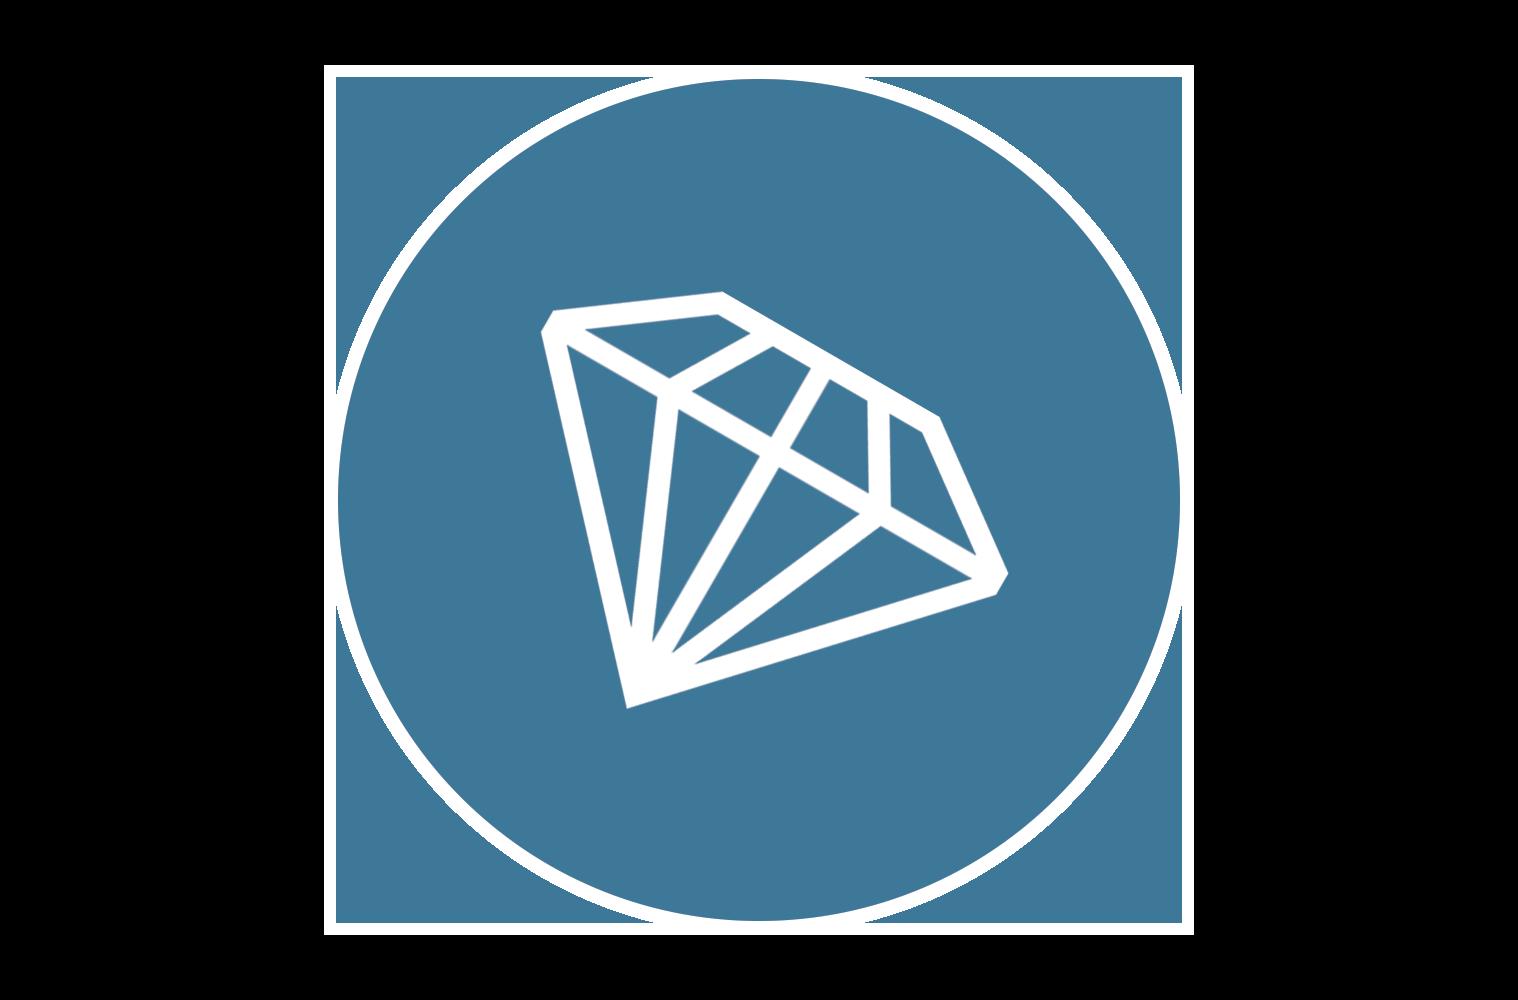 icon_diamant2